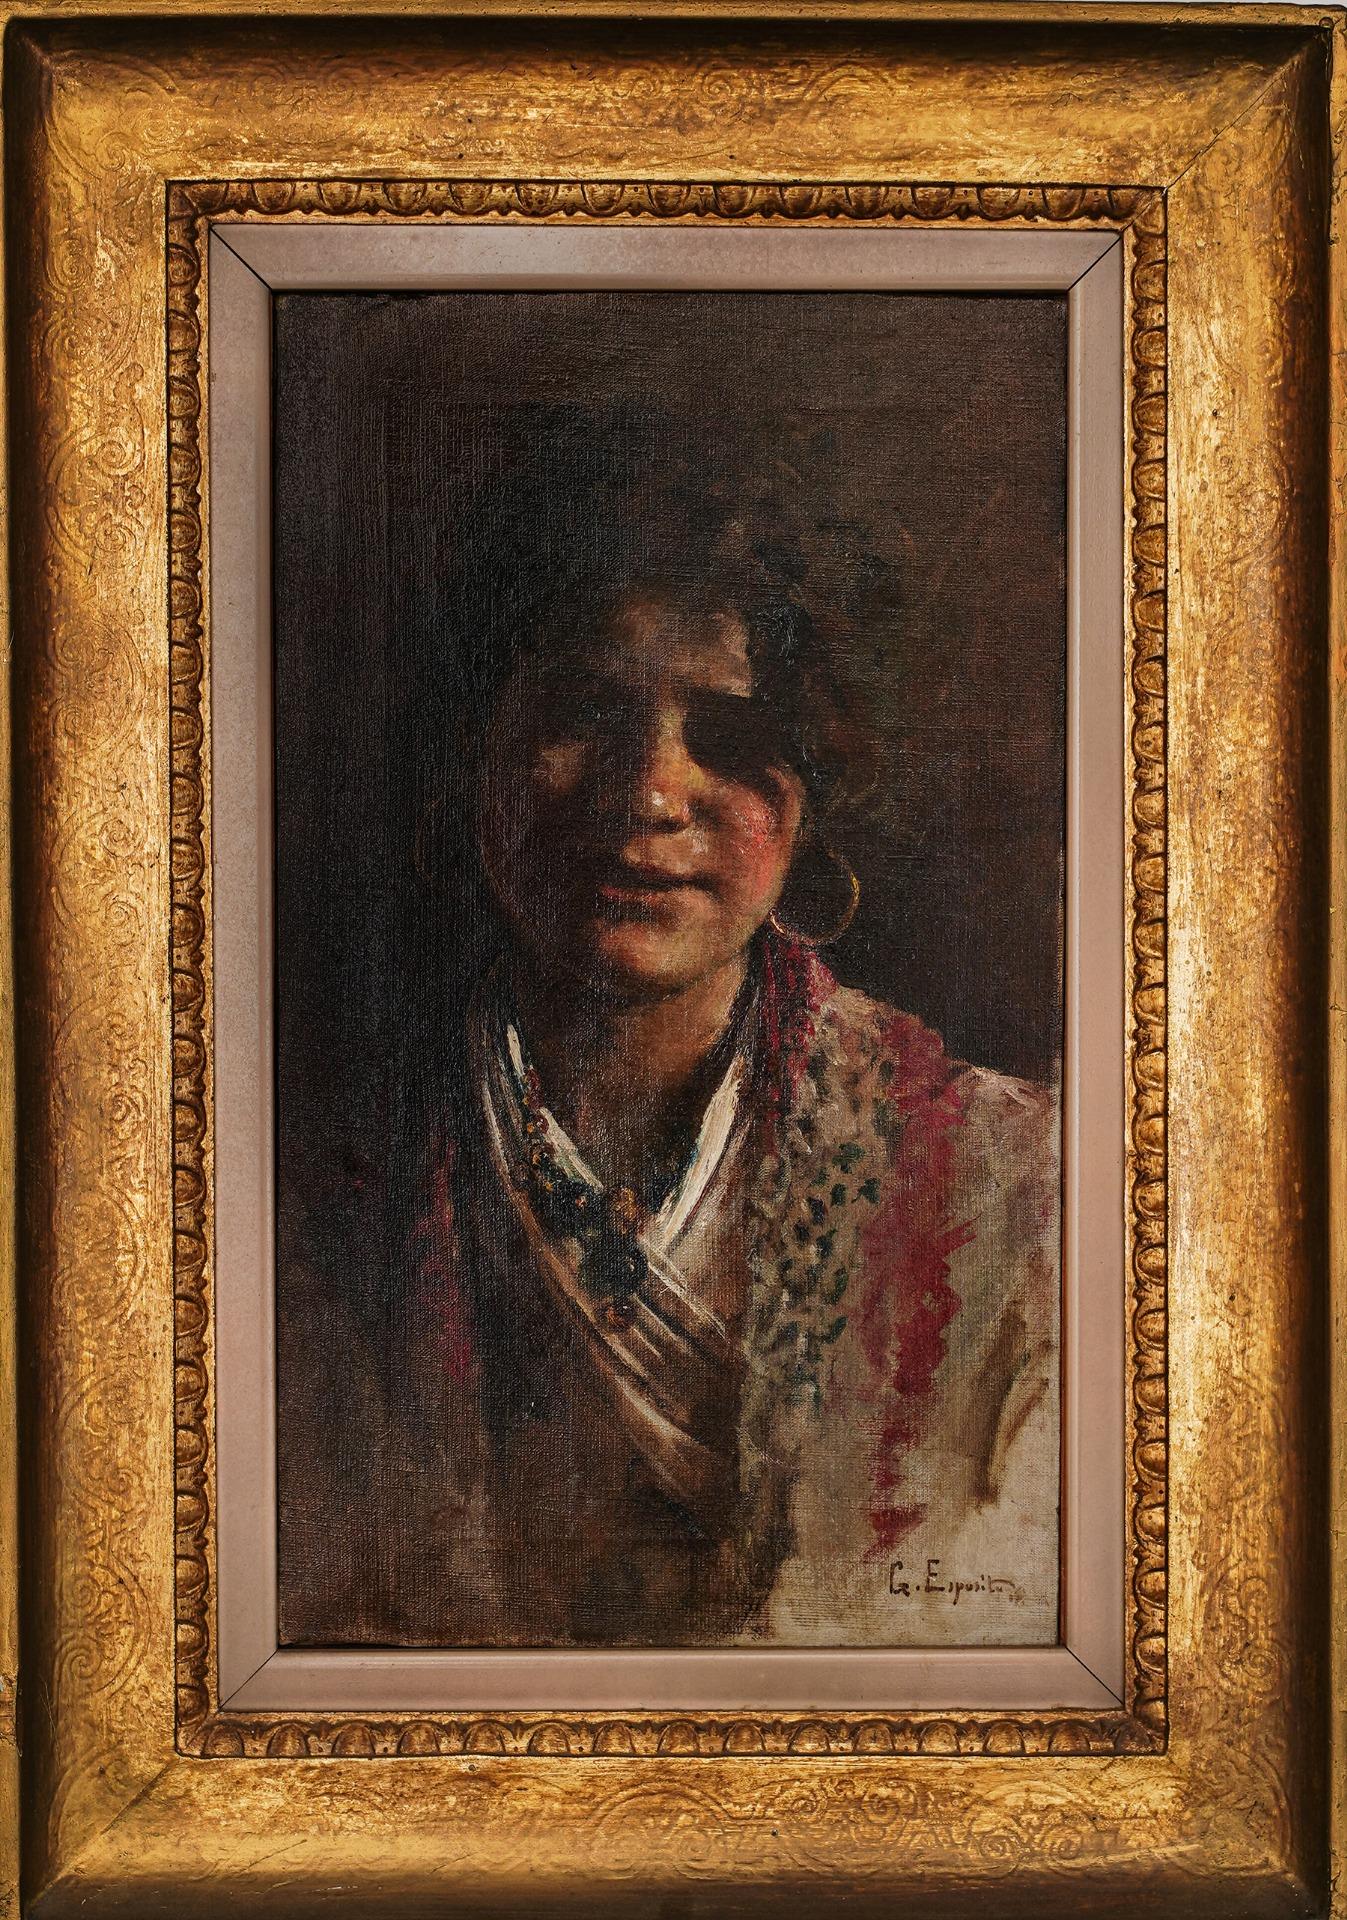 thumb2|Gaetano Esposito. Ciociara - aprox. 1870/80